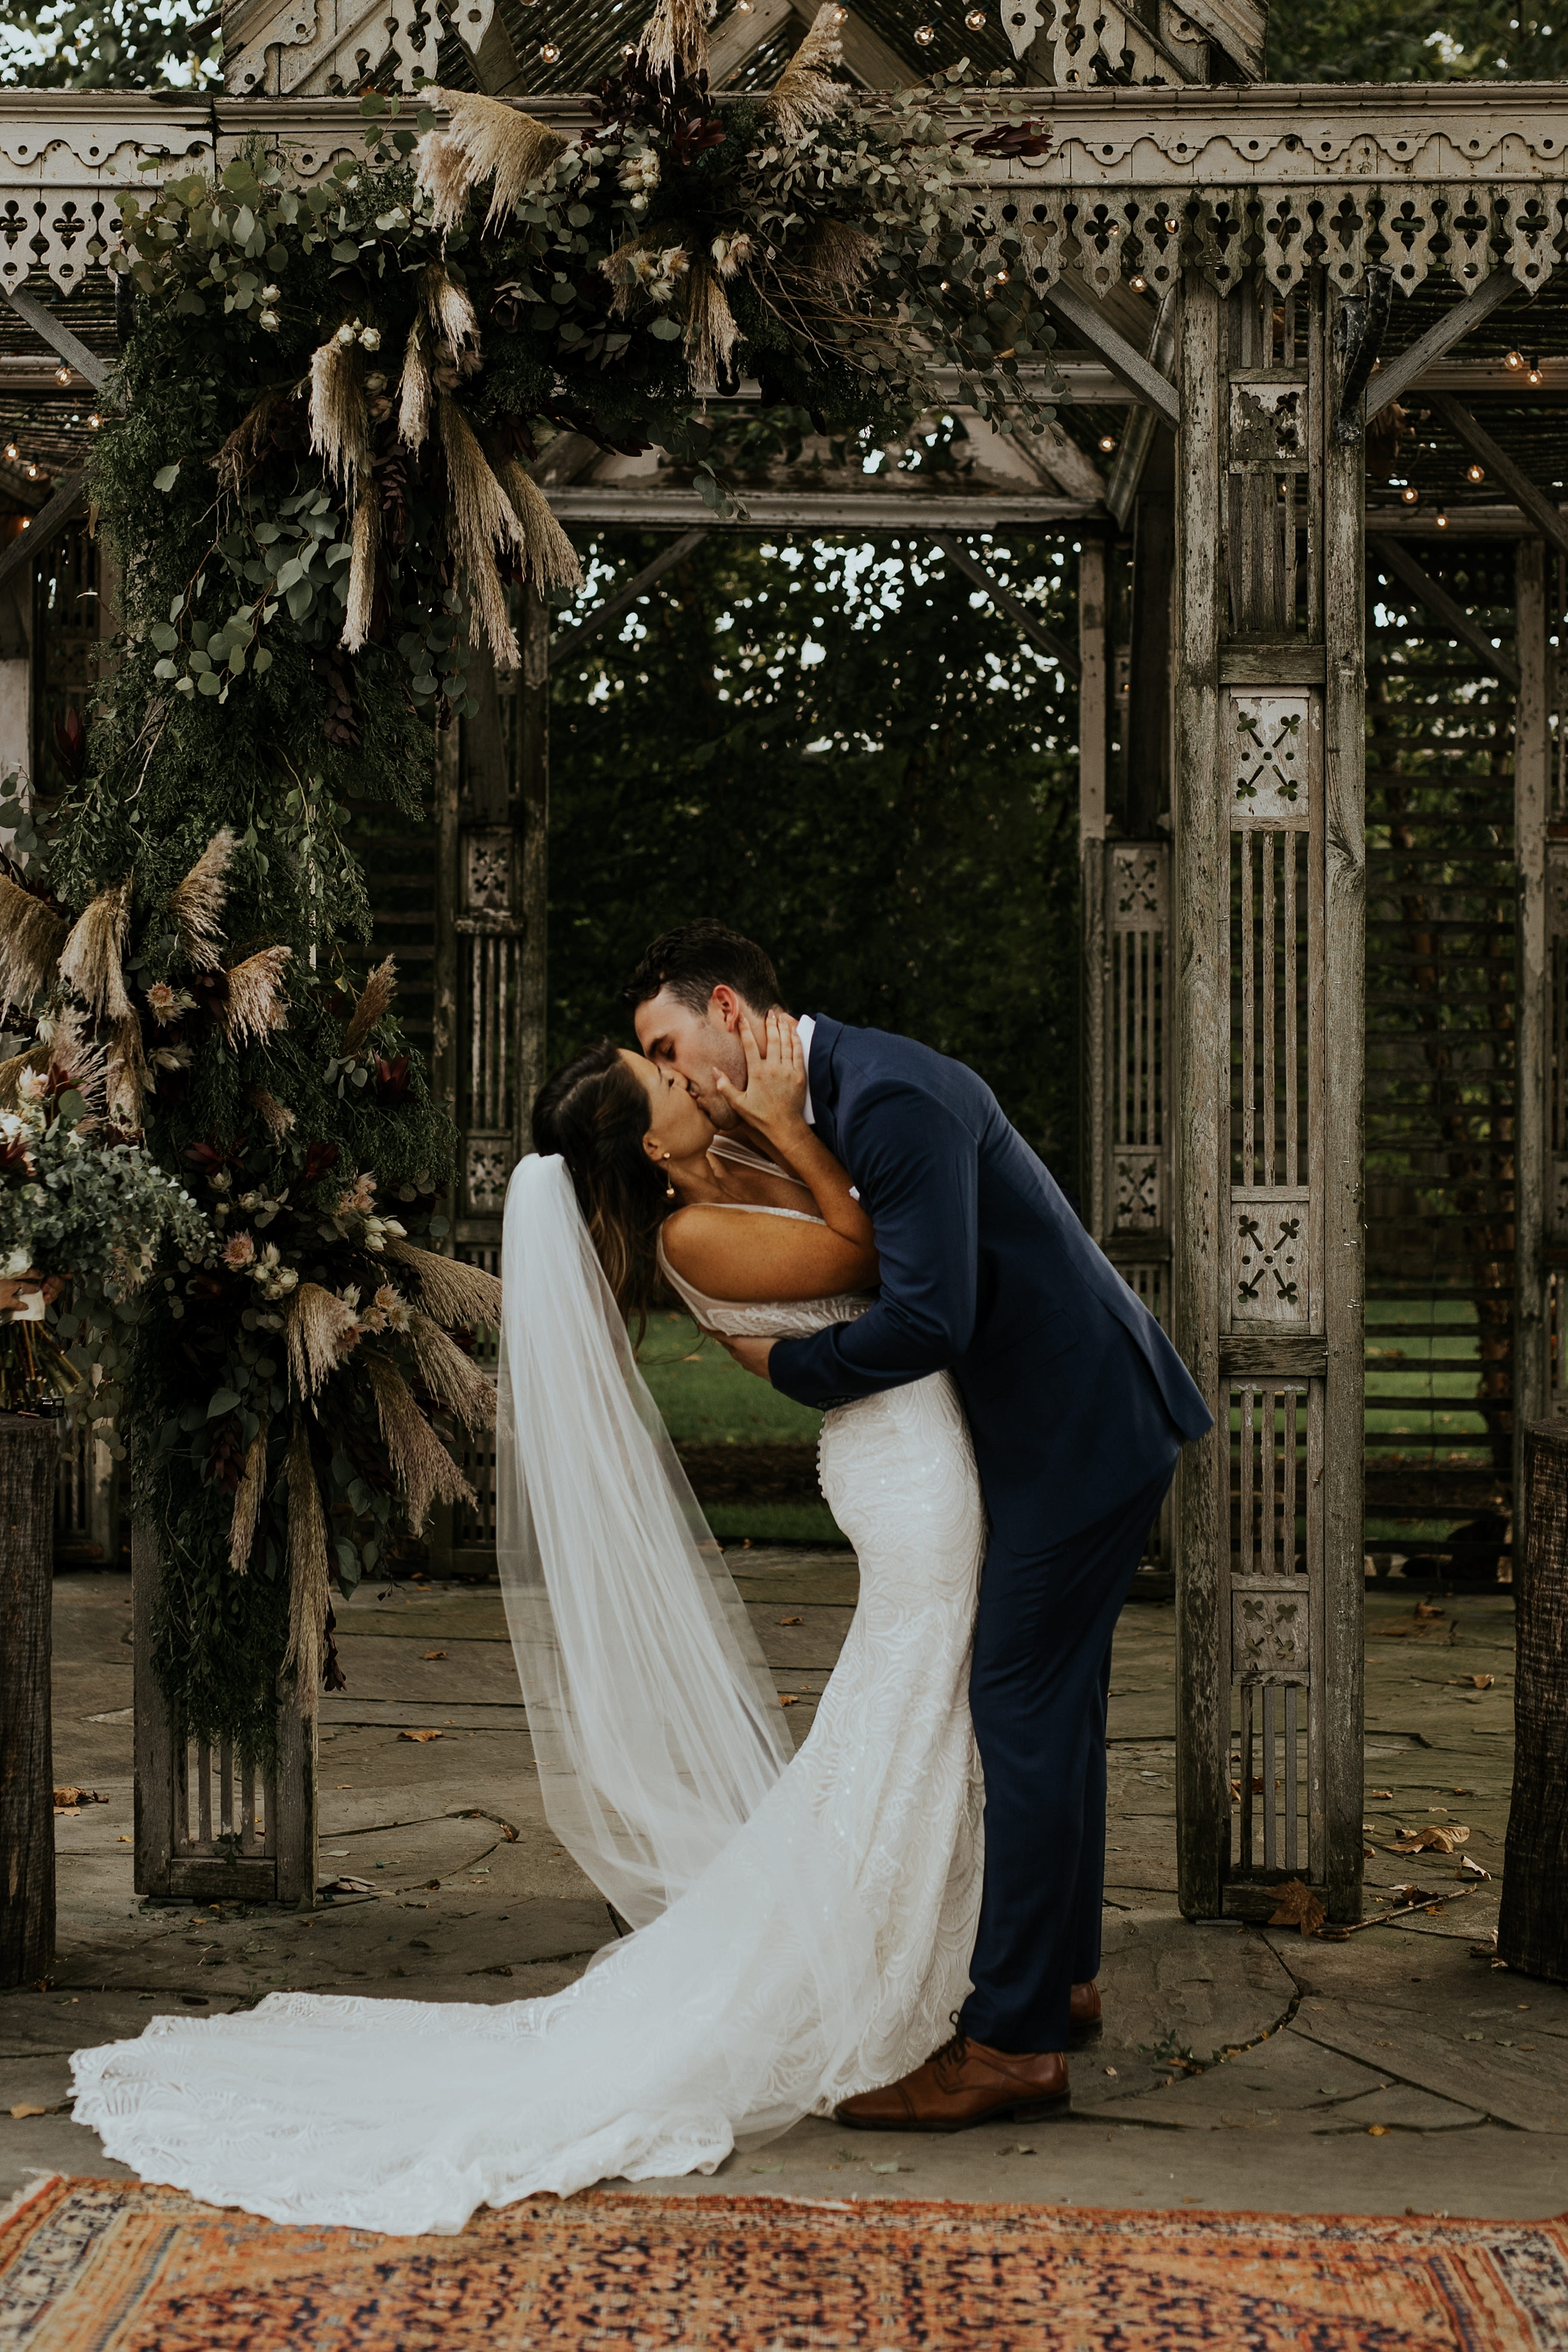 Heartfelt Botanical Terrain at Styers Wedding in Glenn Mills Pennslyvania by Trin Jensen Photography_0030.jpg